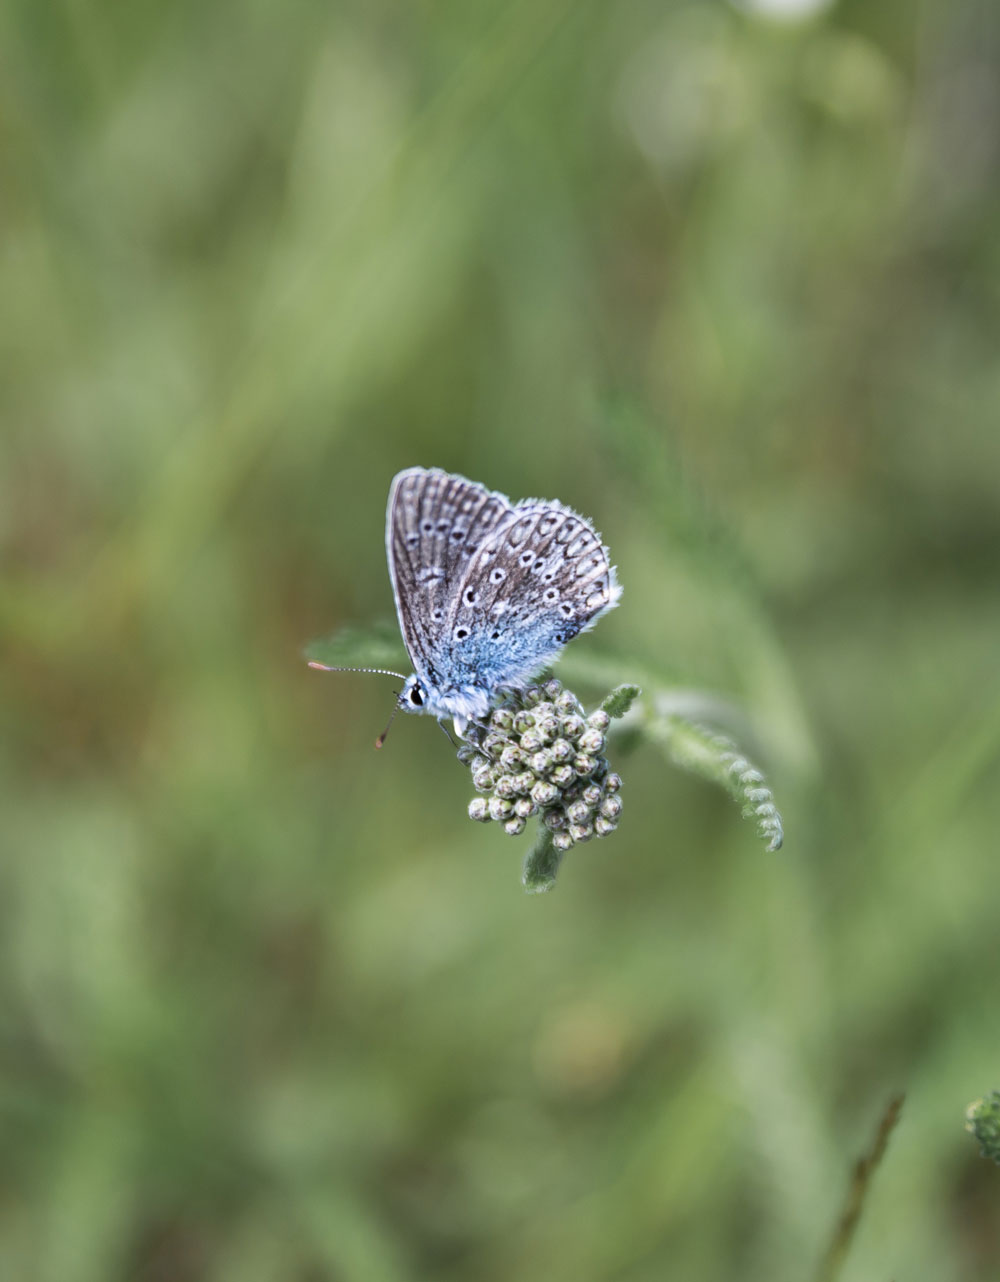 Blåfugl i Hovdala naturområde